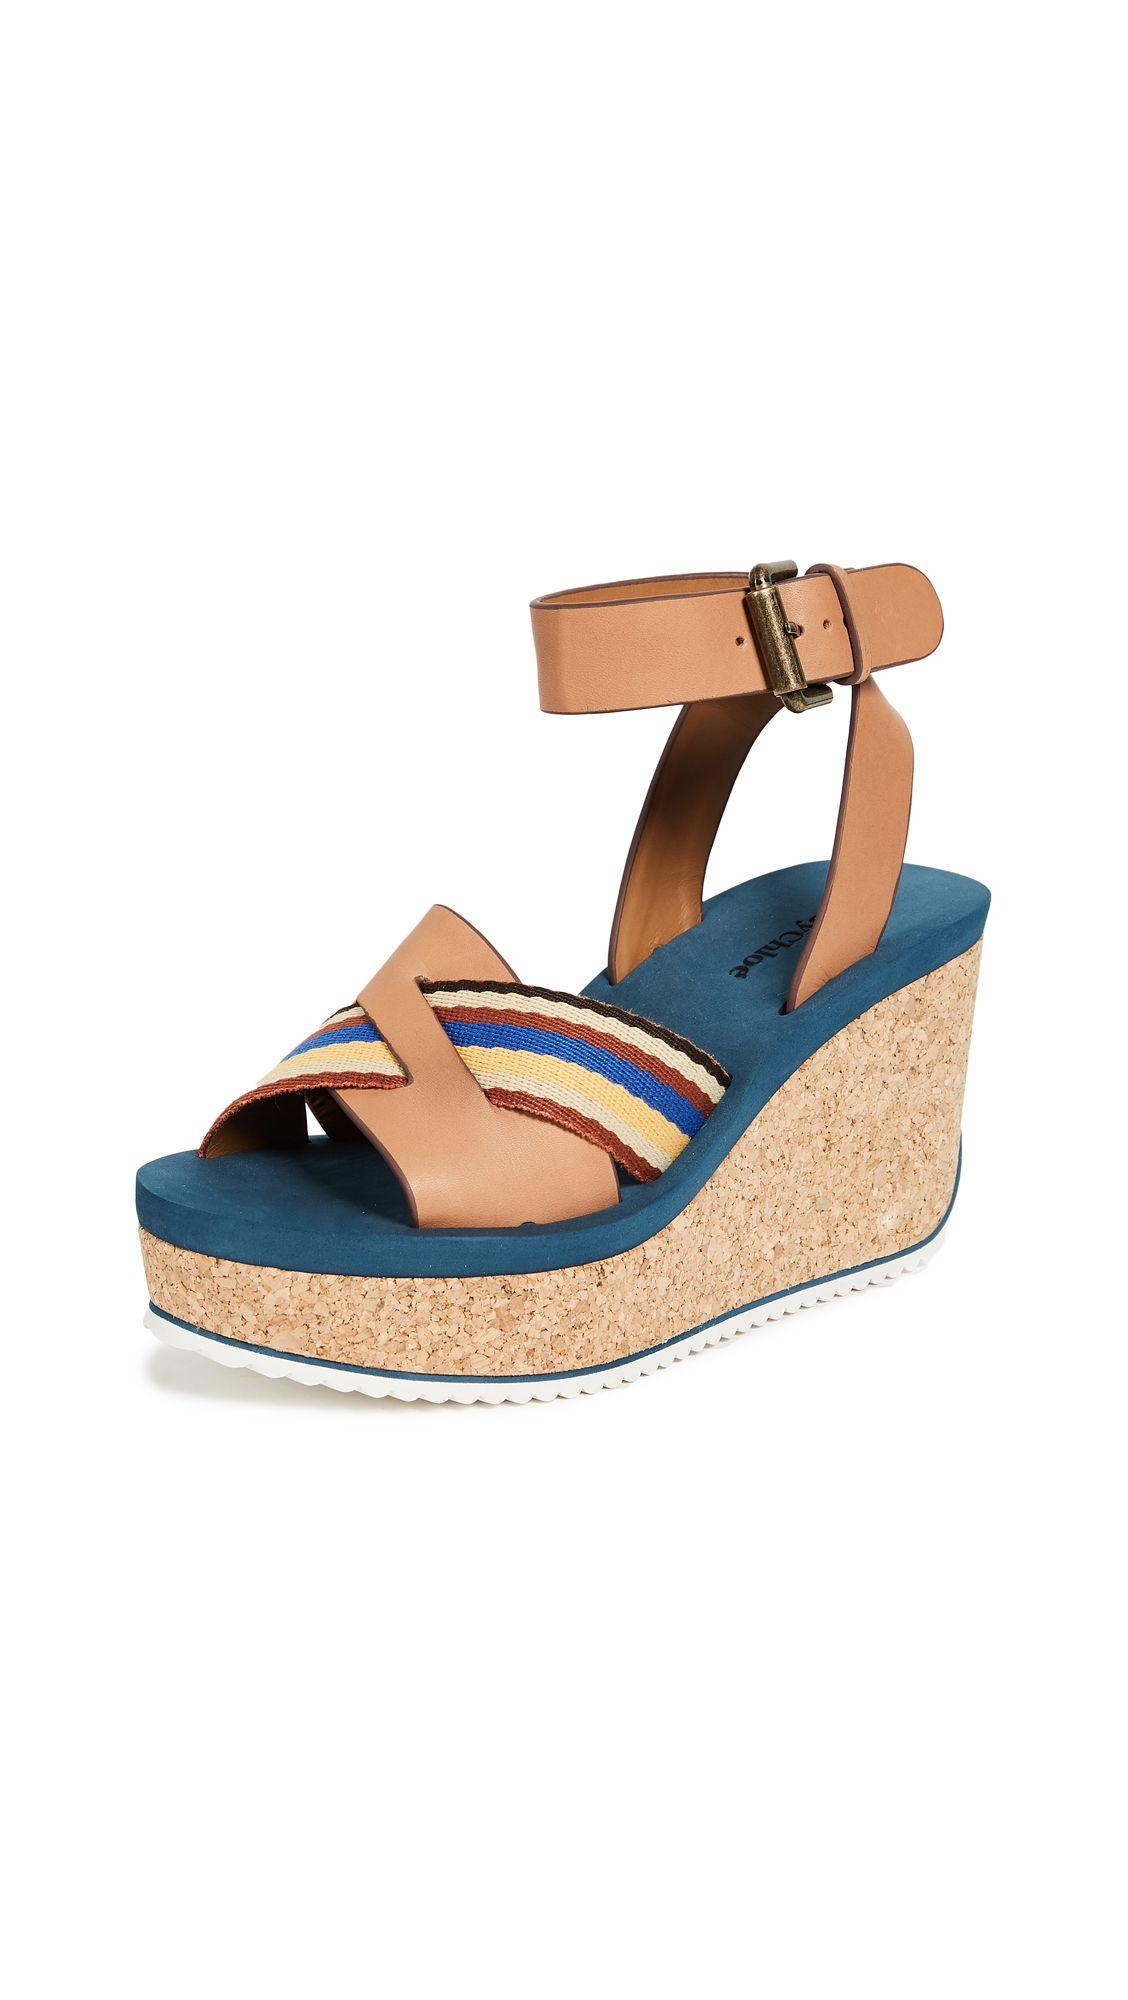 a0e5d2acd19 SEE BY CHLOÉ MINA CORK WEDGE SANDALS.  seebychloé  shoes